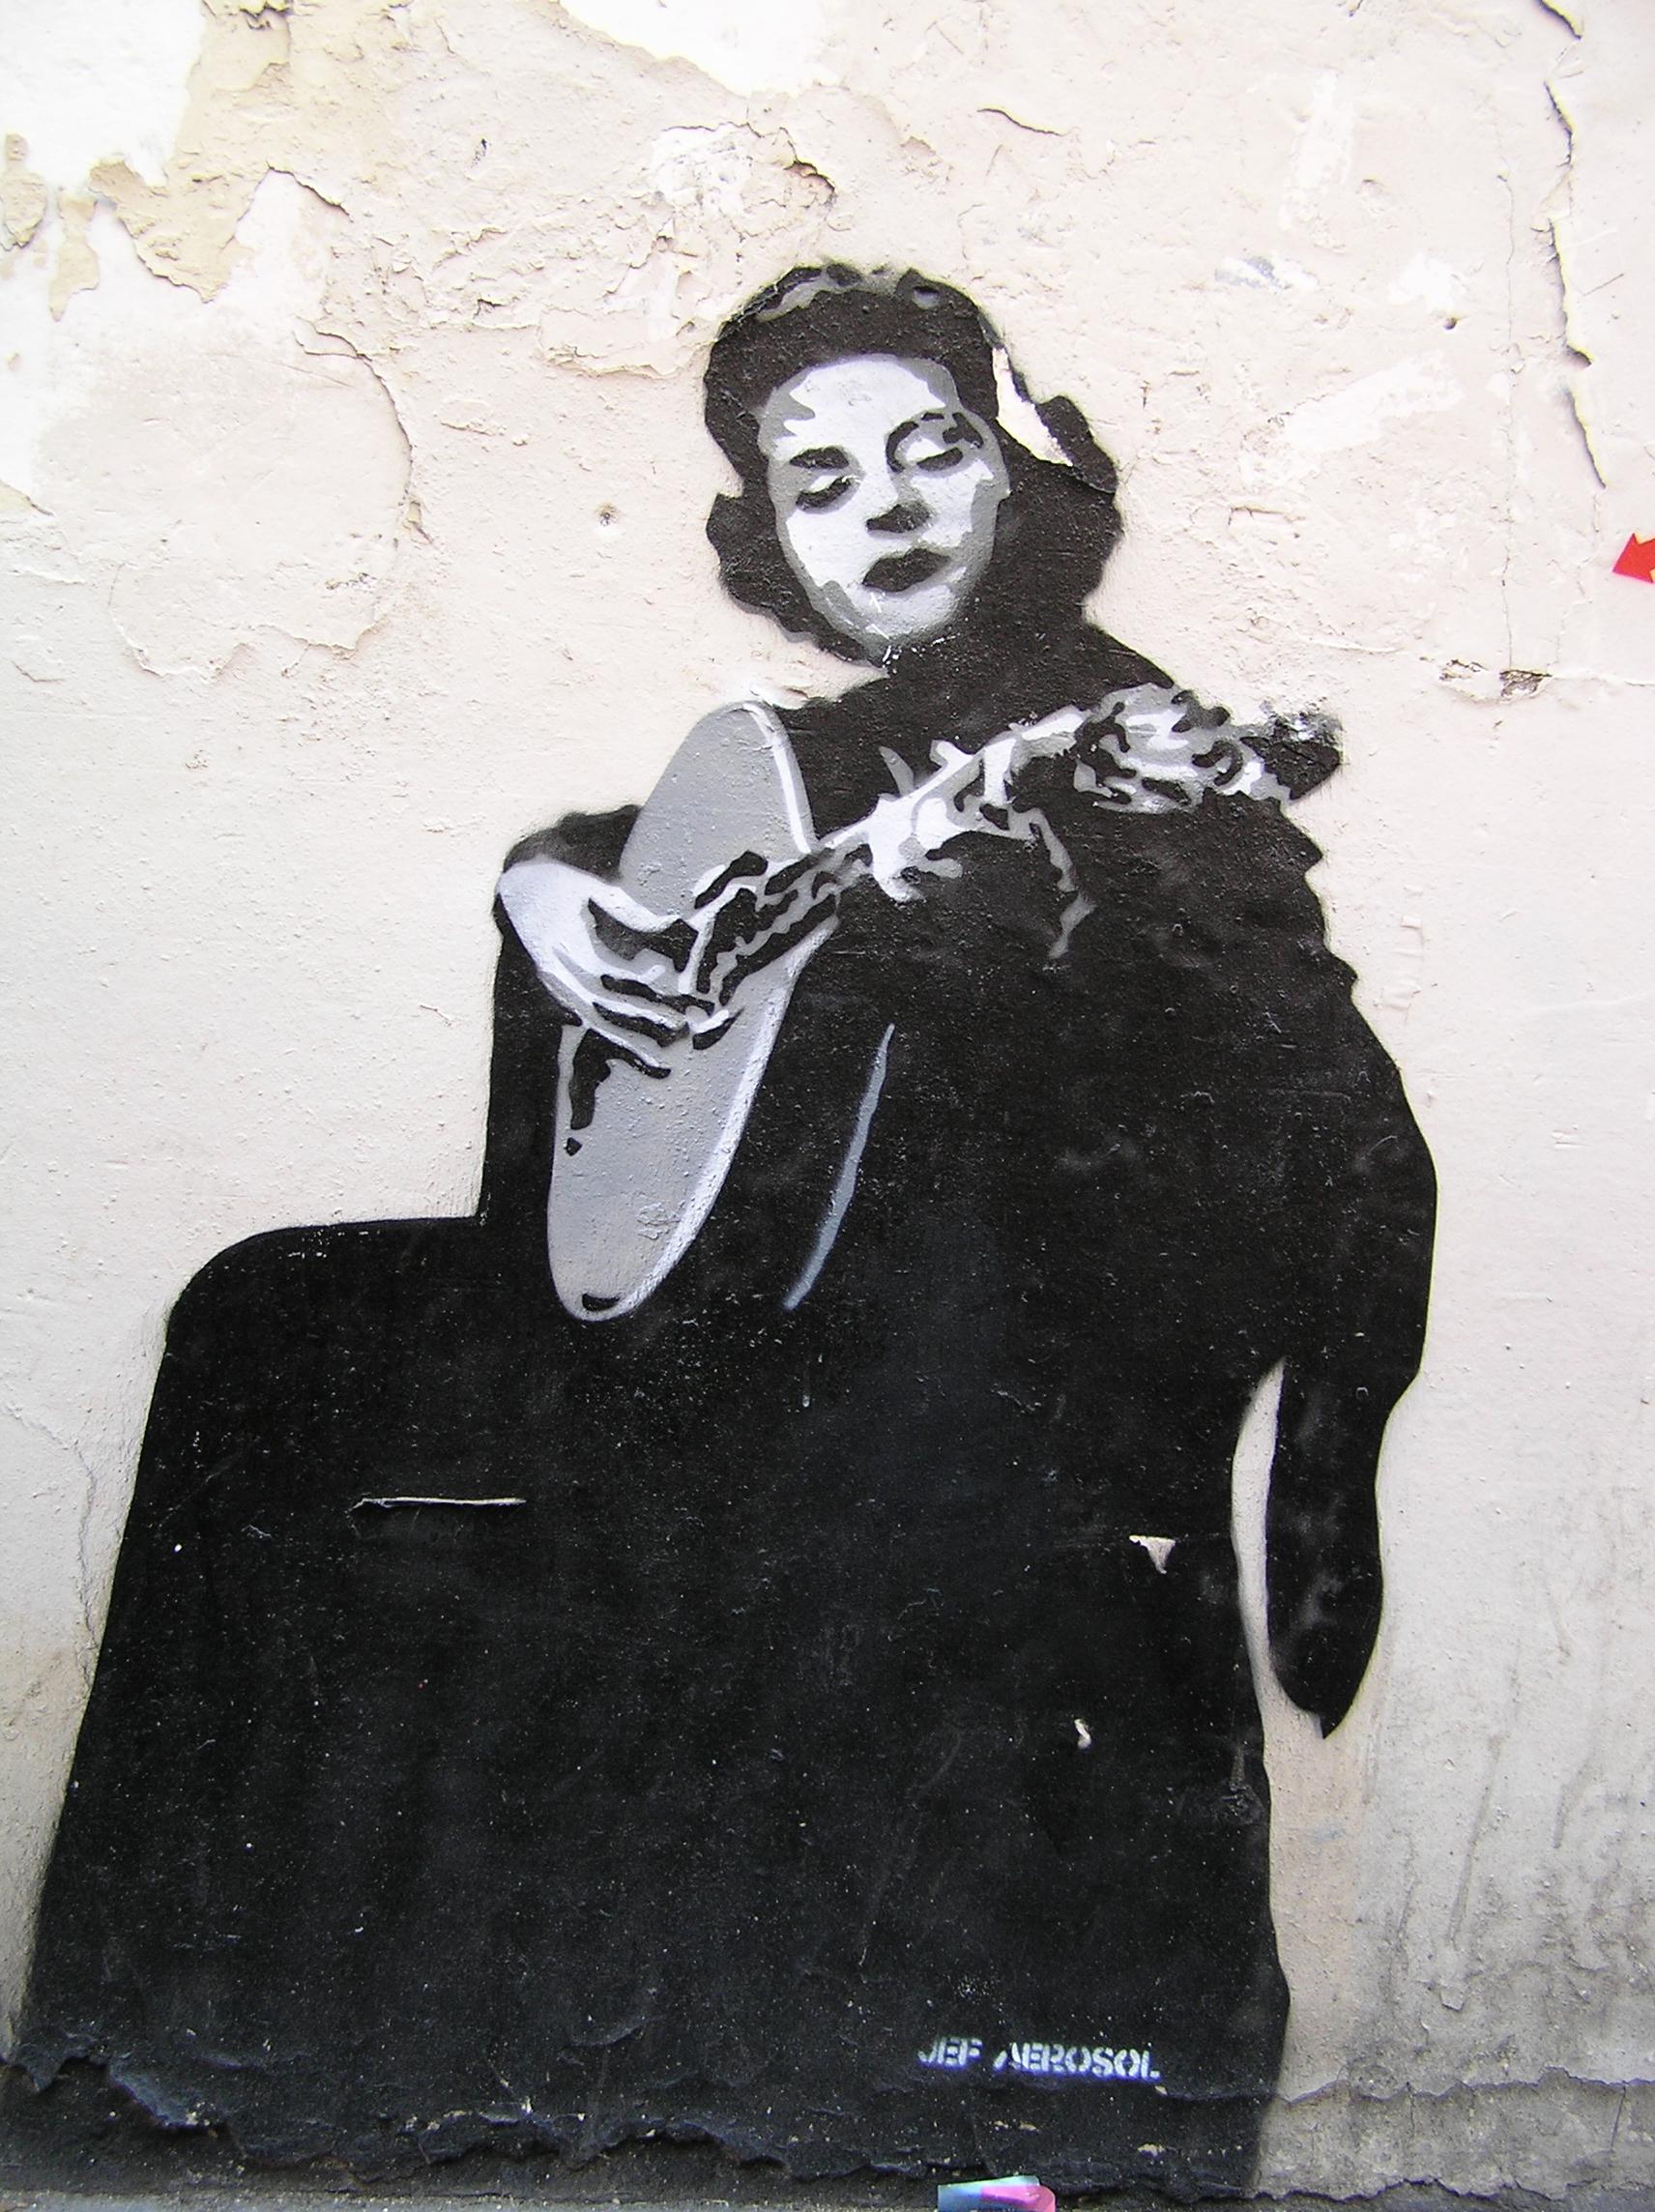 Граффити, изображающее Амалию Родригес. 2008. Источник https://upload.wikimedia.org/